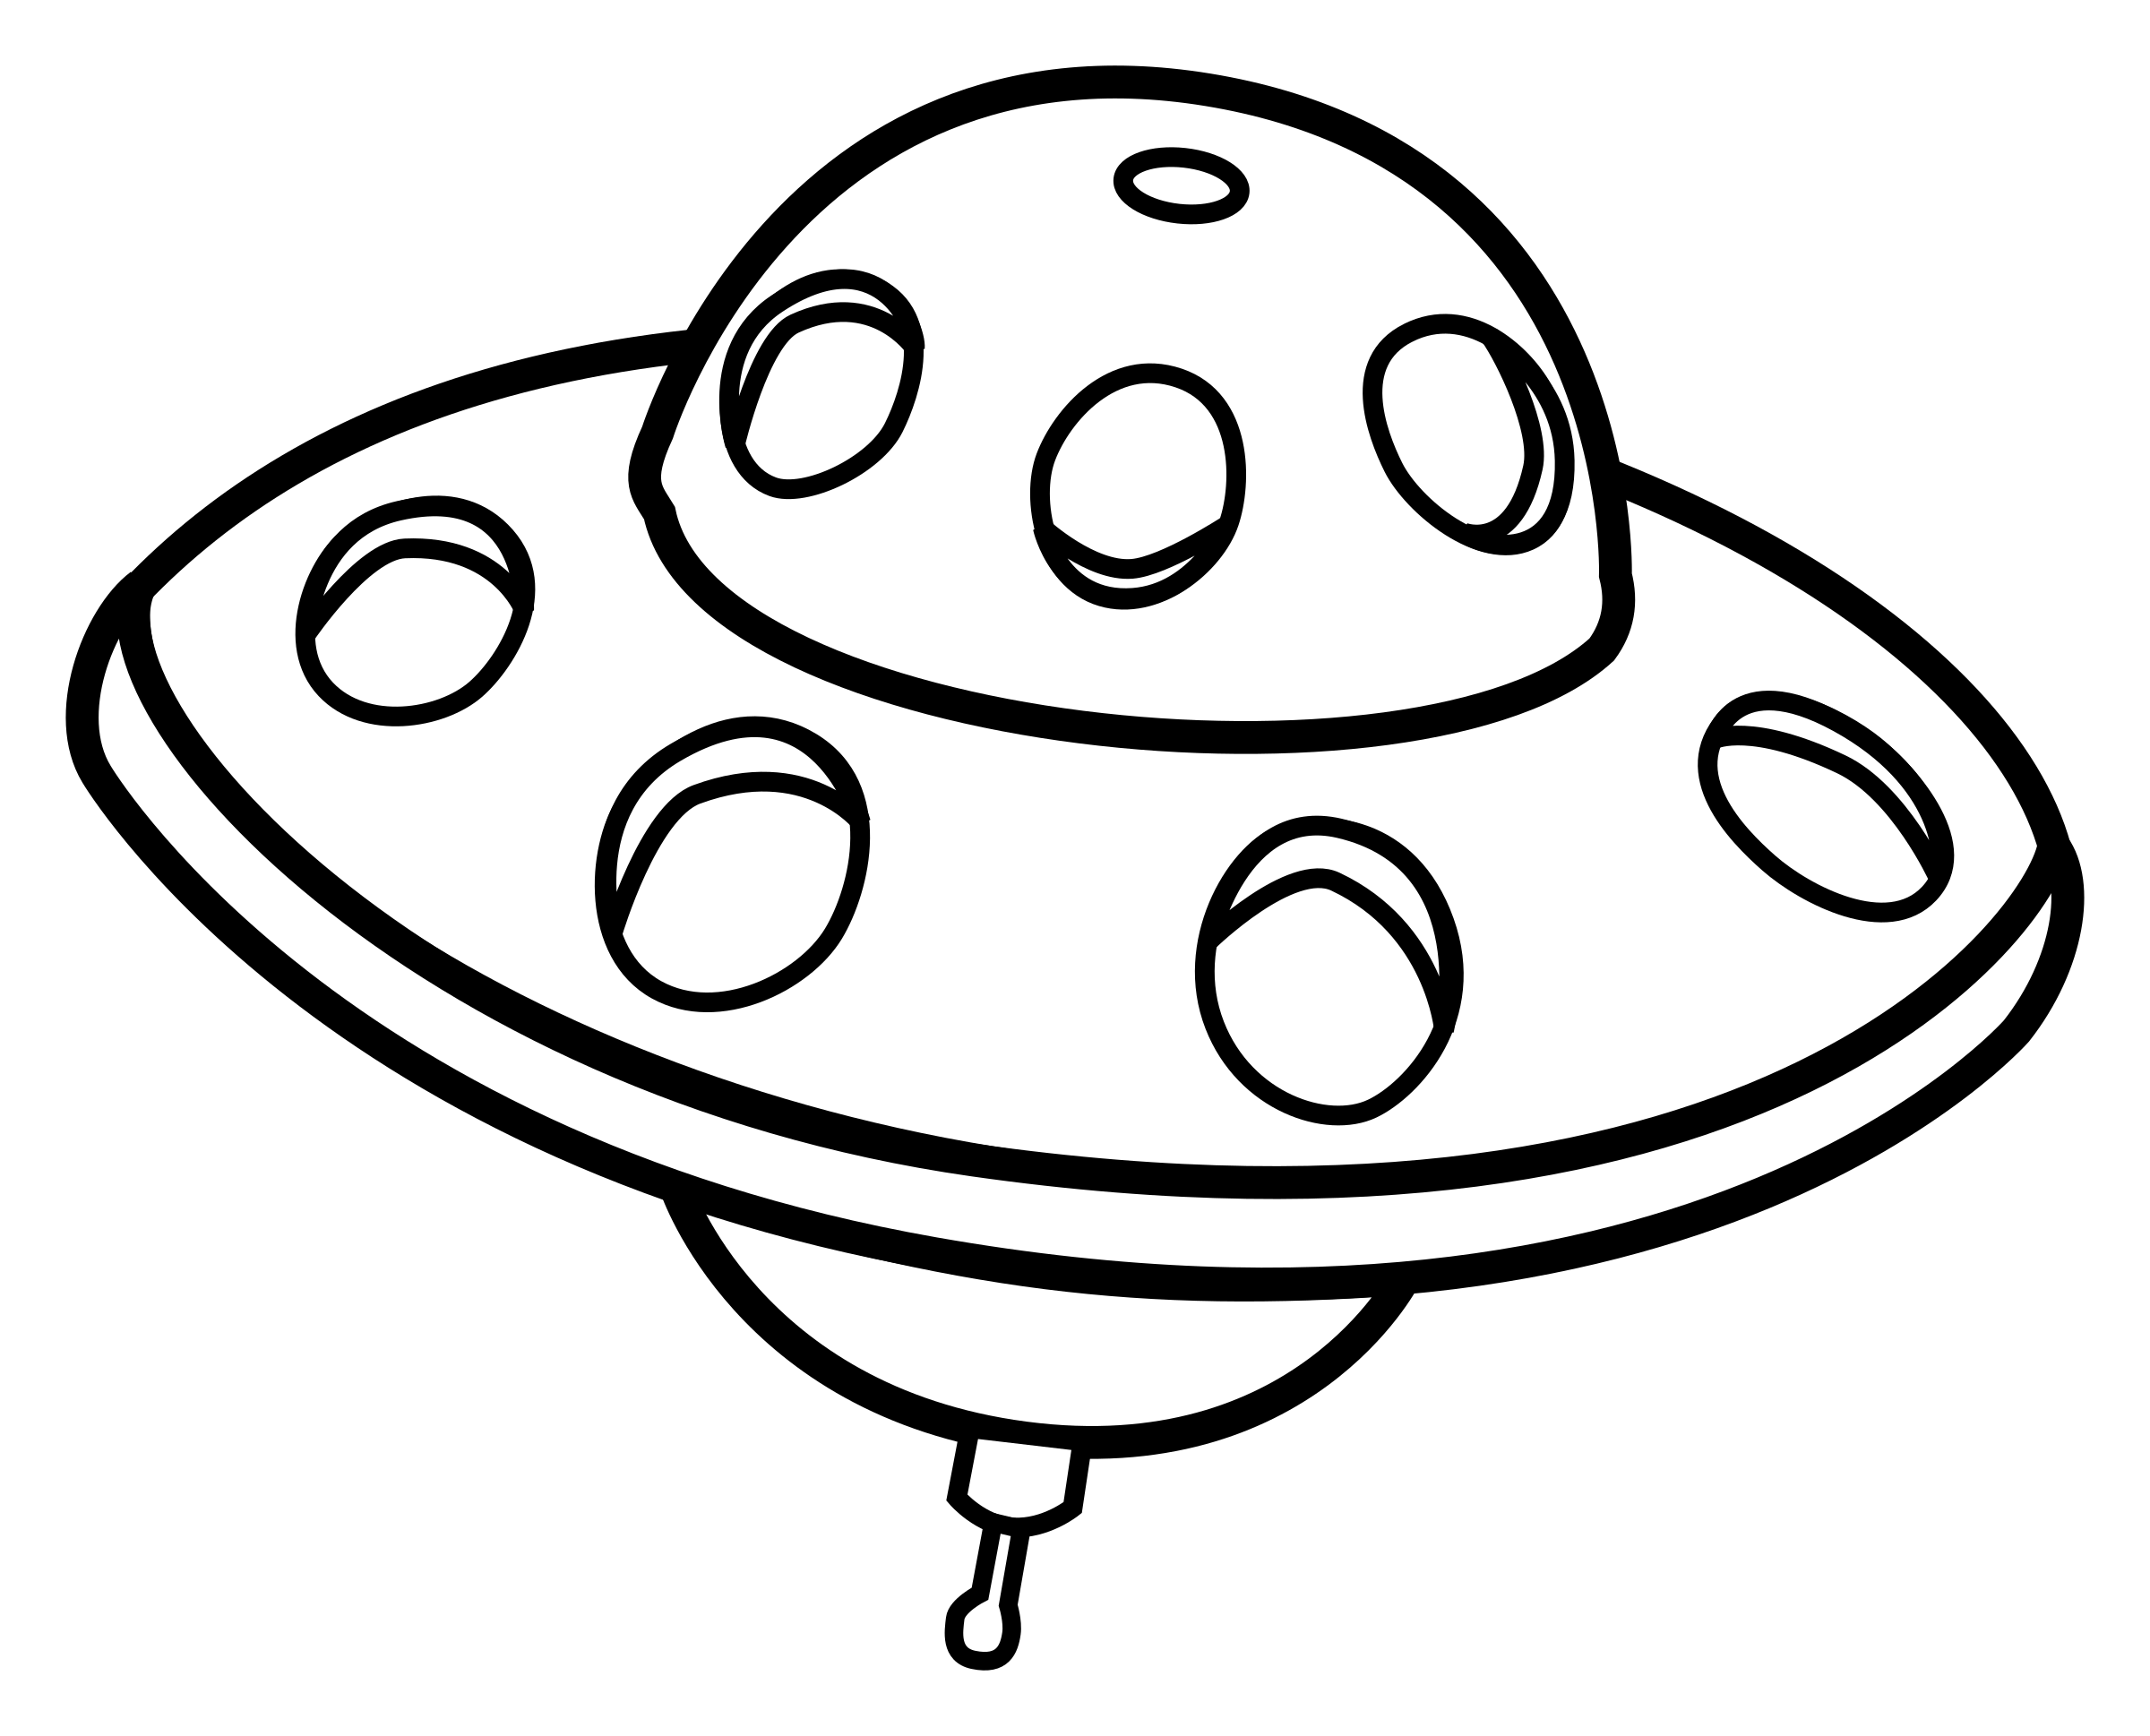 Drawn clip free on. Ufo clipart line art